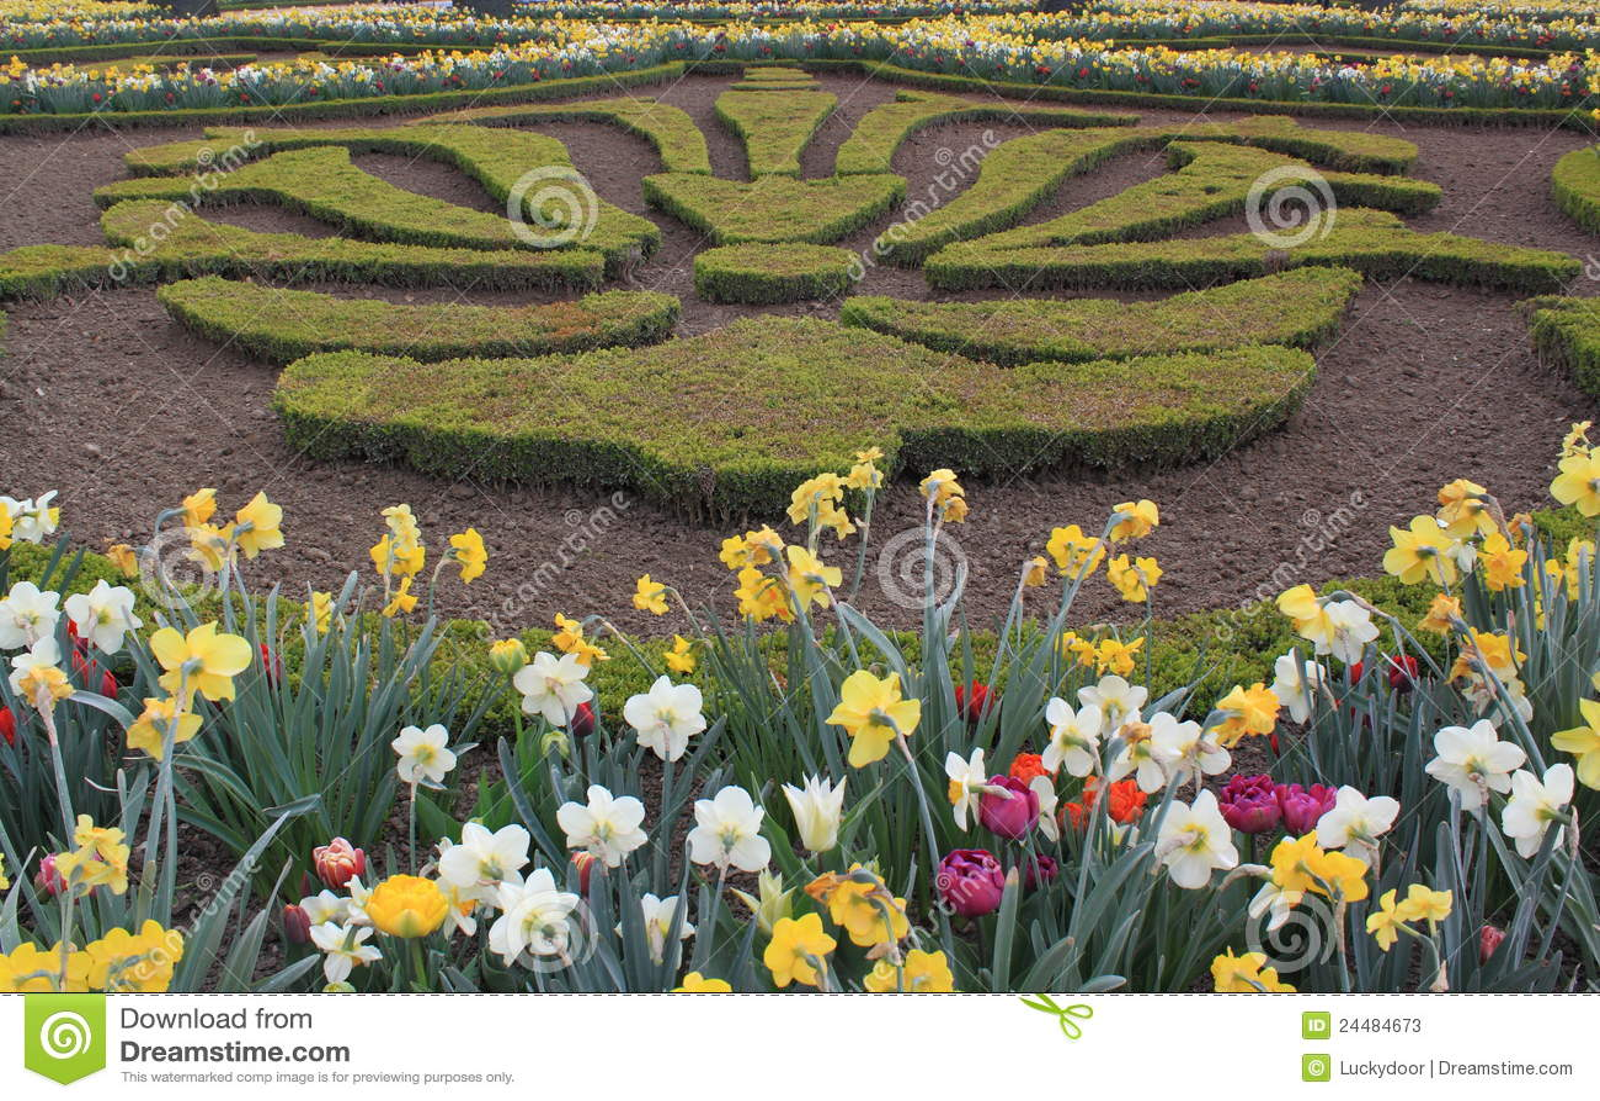 Jardin de versailles photos stock image 24484673 for Jardin versailles